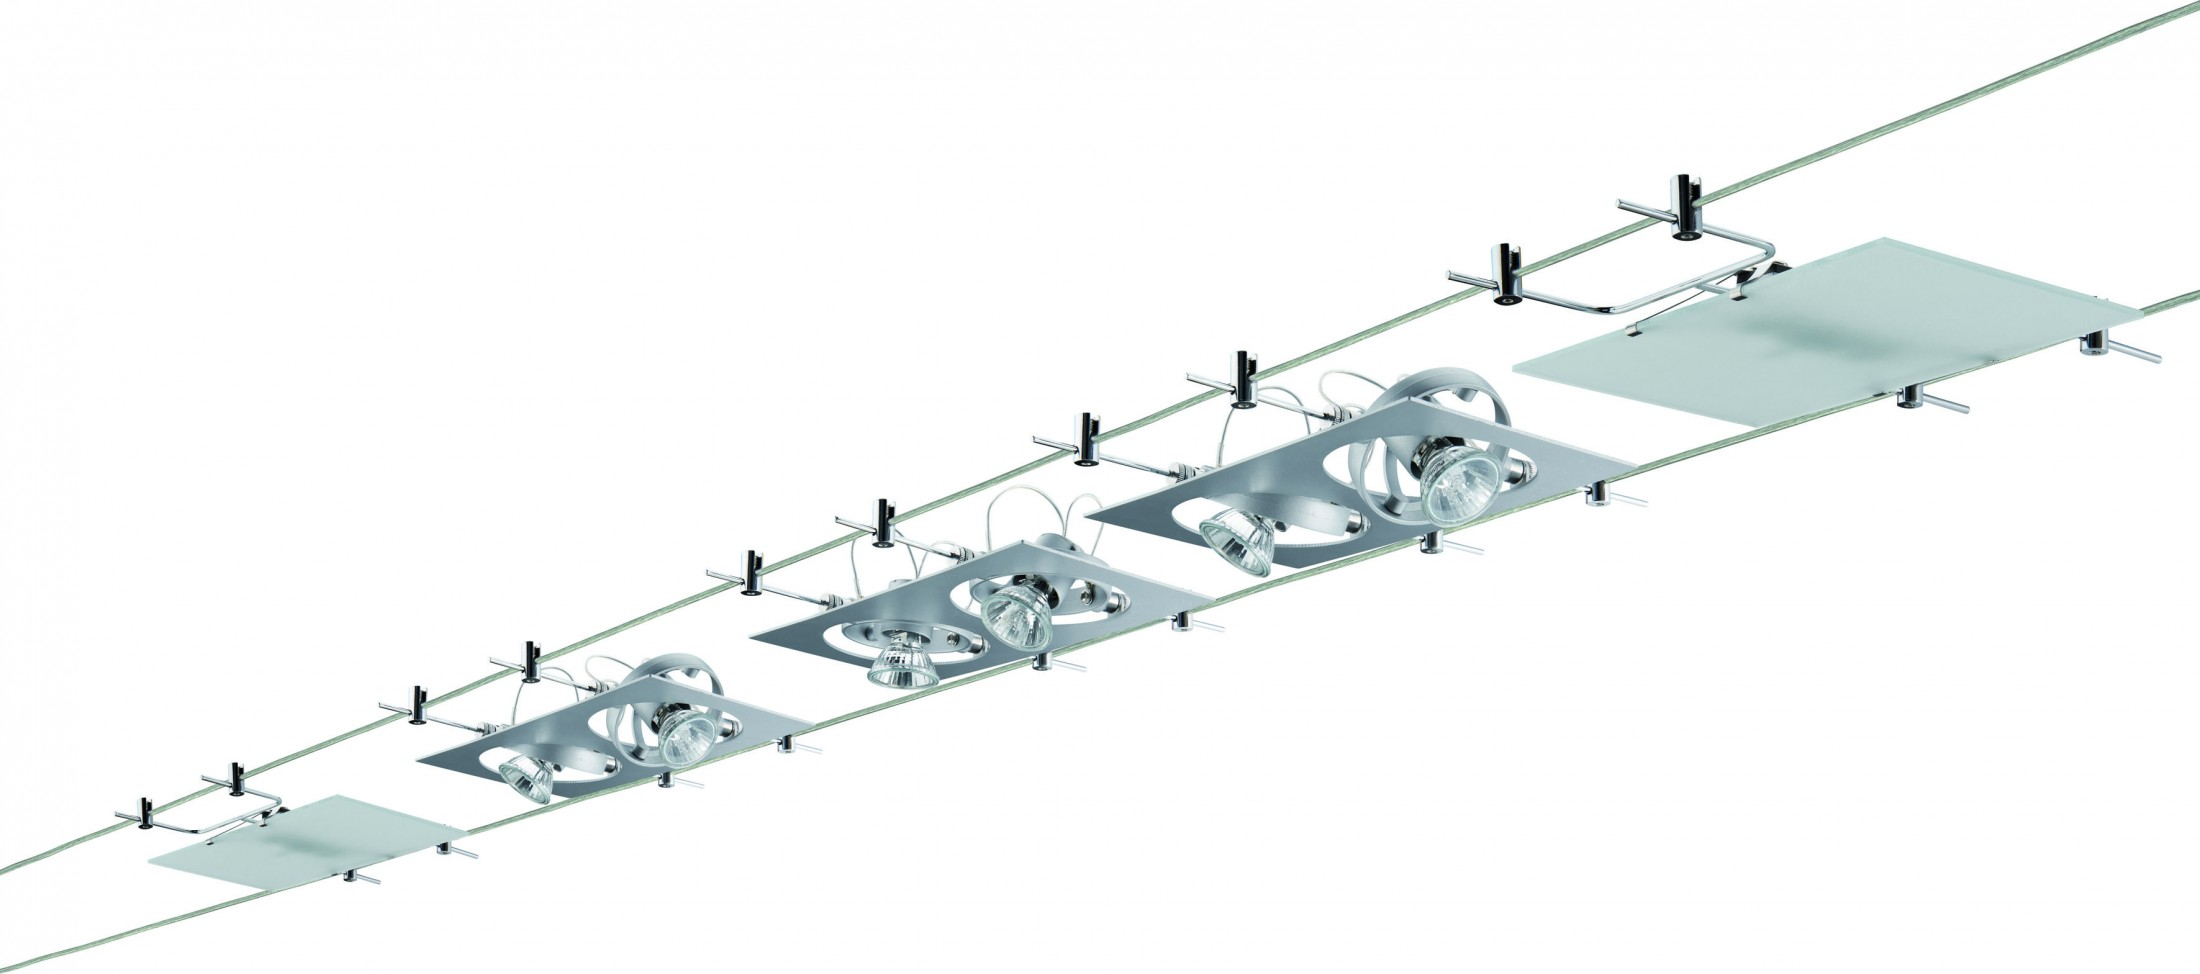 paulmann seil komplett set wire system outline 5x 2x20 w gu4 g4 chrom matt 230 12v 210va. Black Bedroom Furniture Sets. Home Design Ideas